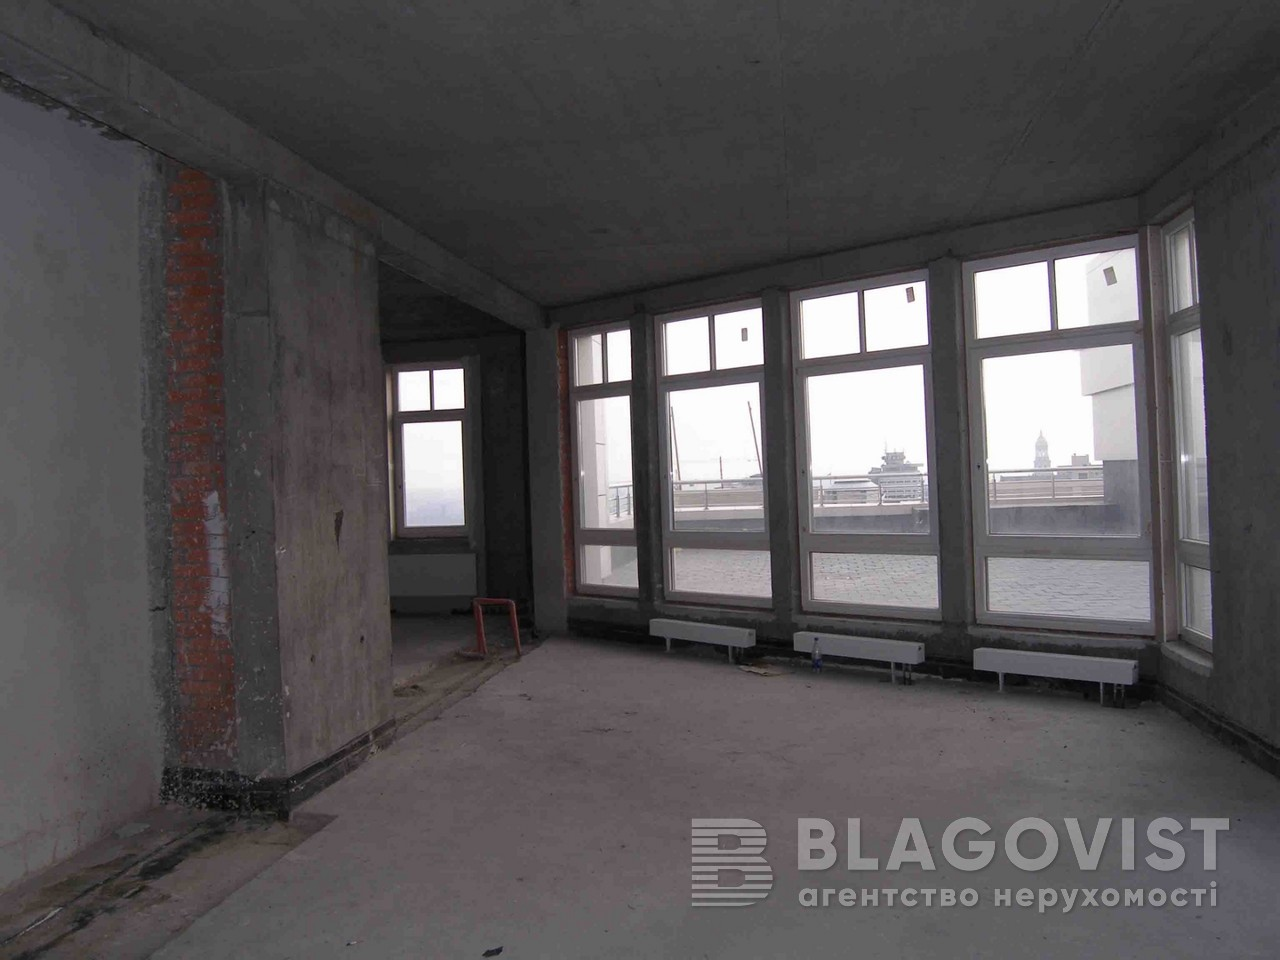 Квартира H-12557, Грушевского Михаила, 9а, Киев - Фото 6